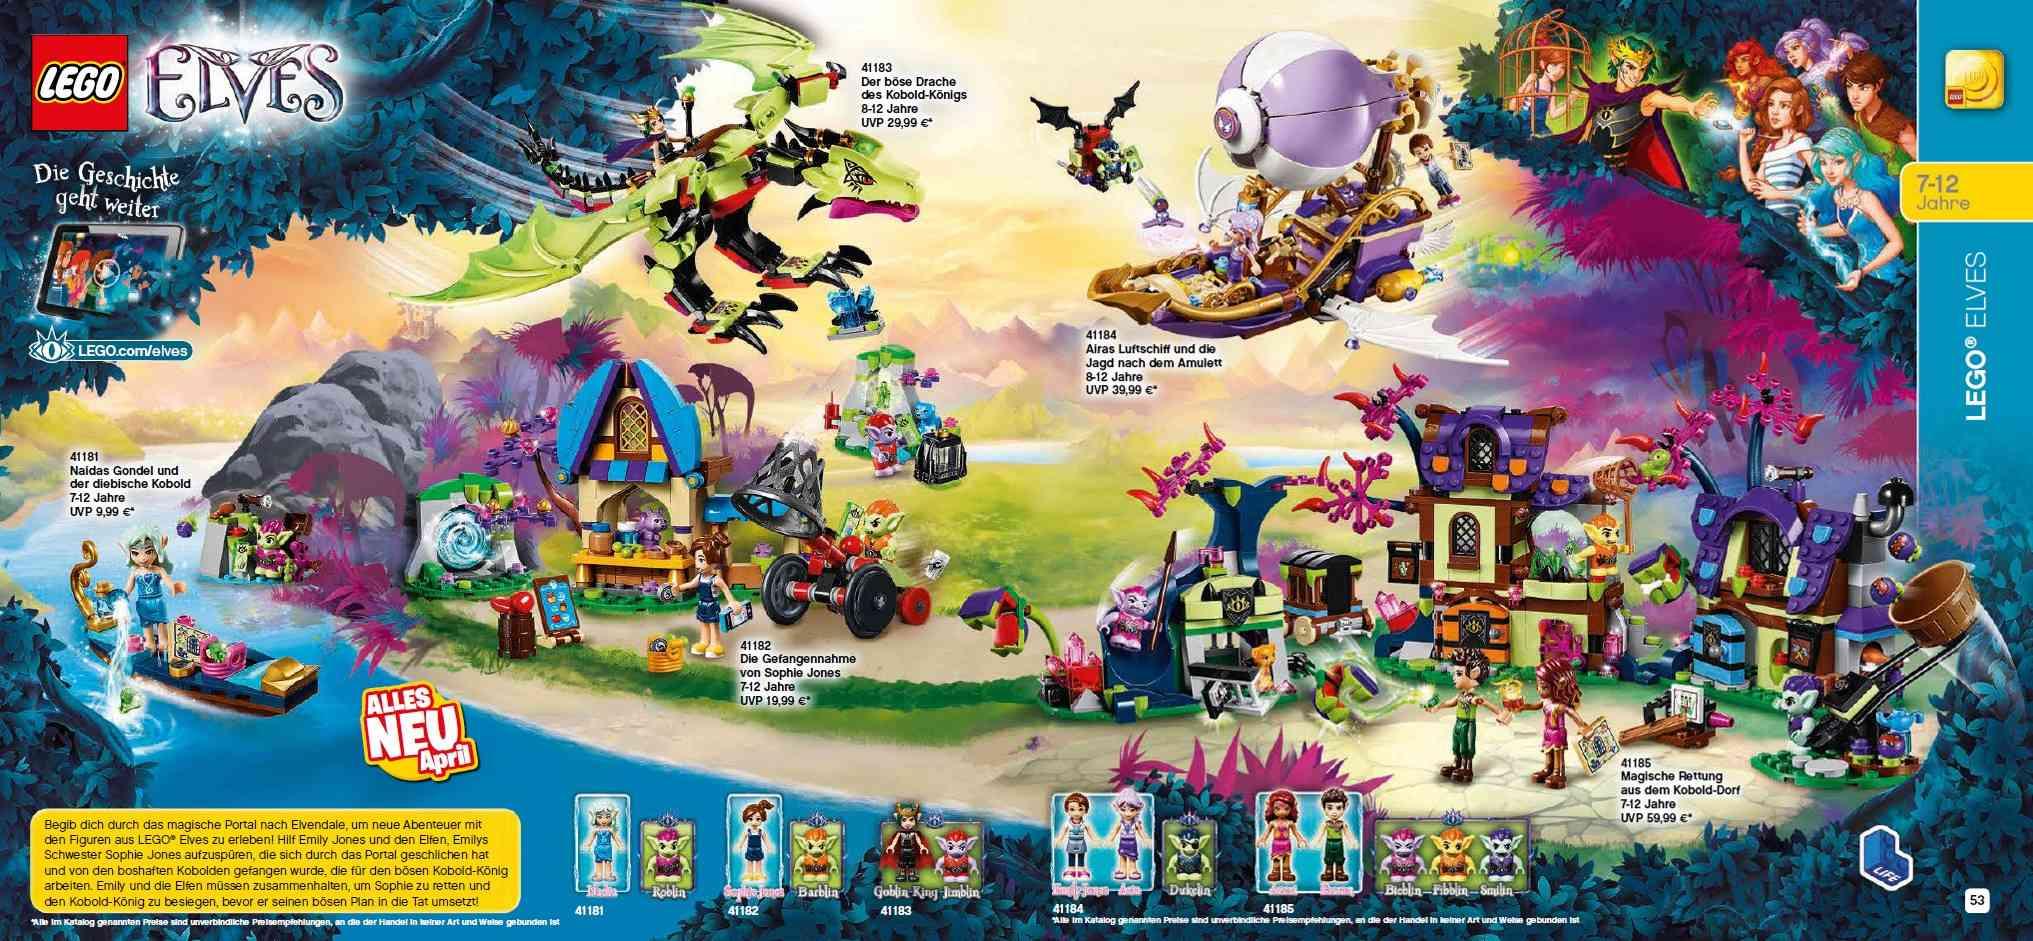 Lego Elves 2017 - Page 3 Projet12